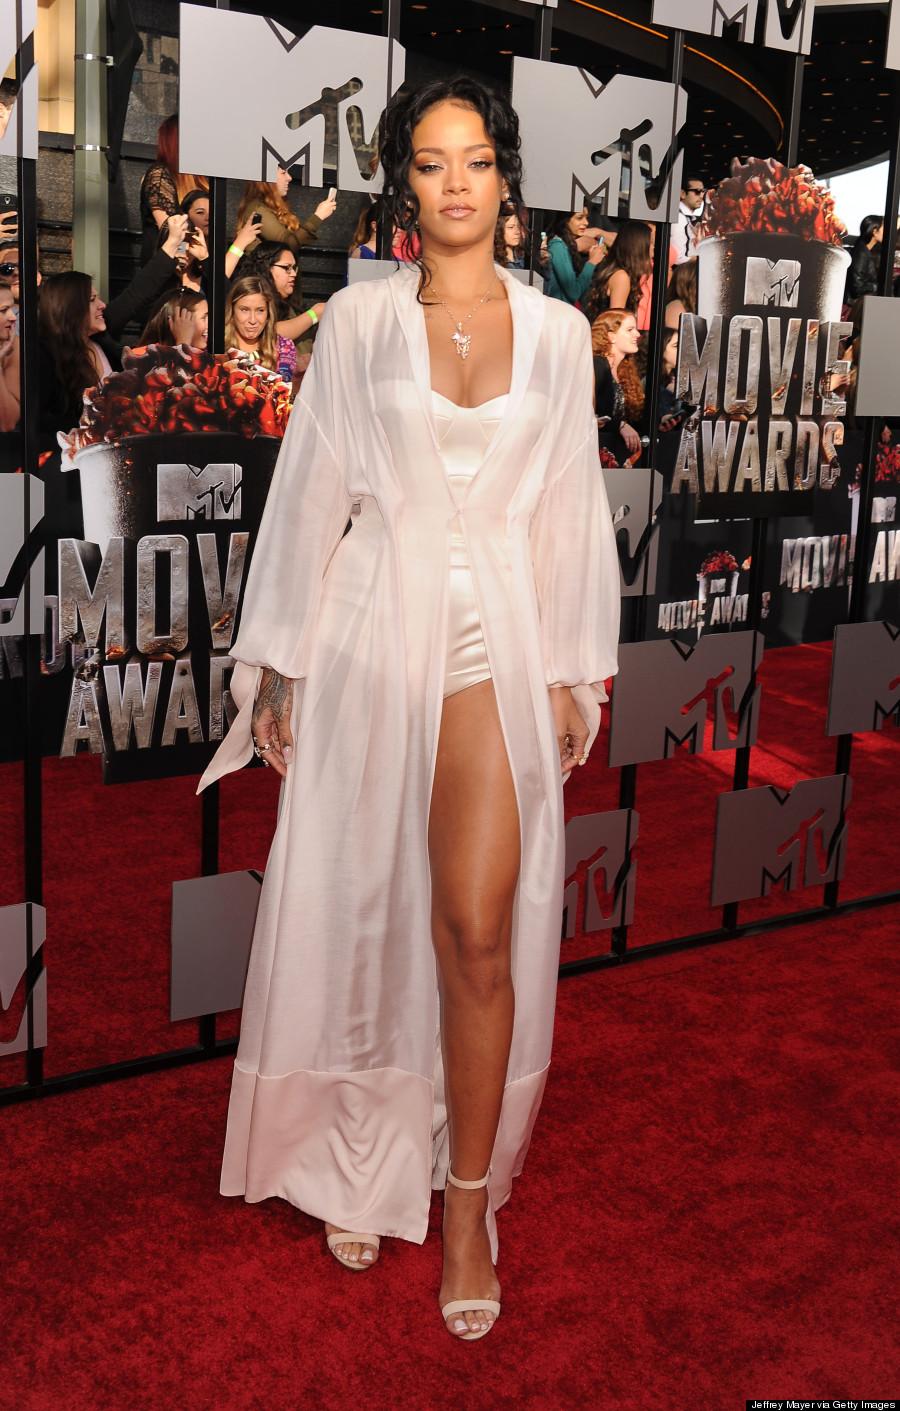 Rihanna 2014 Red Carpet Dress